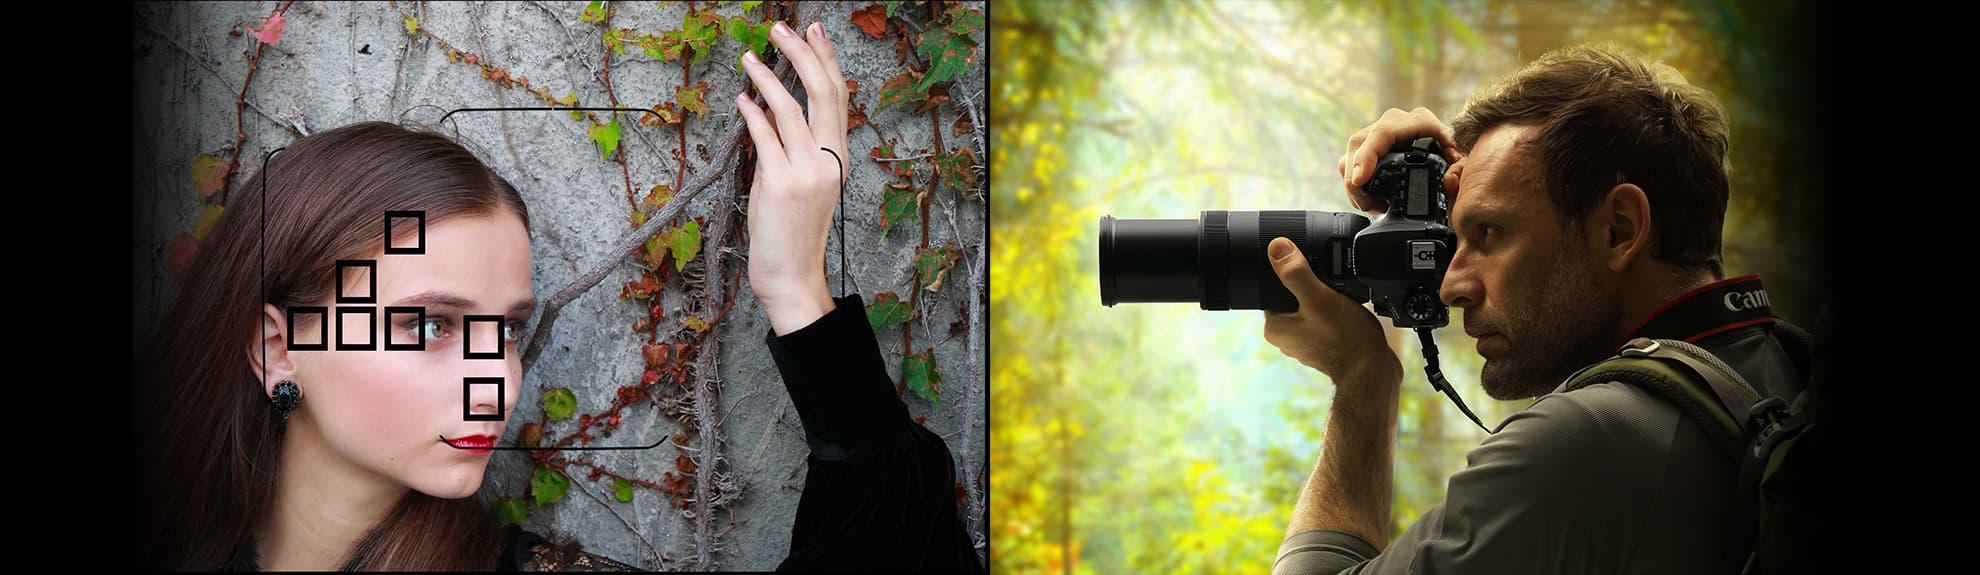 فوکوس و نورسنجی در دوربین عکاسی 90D